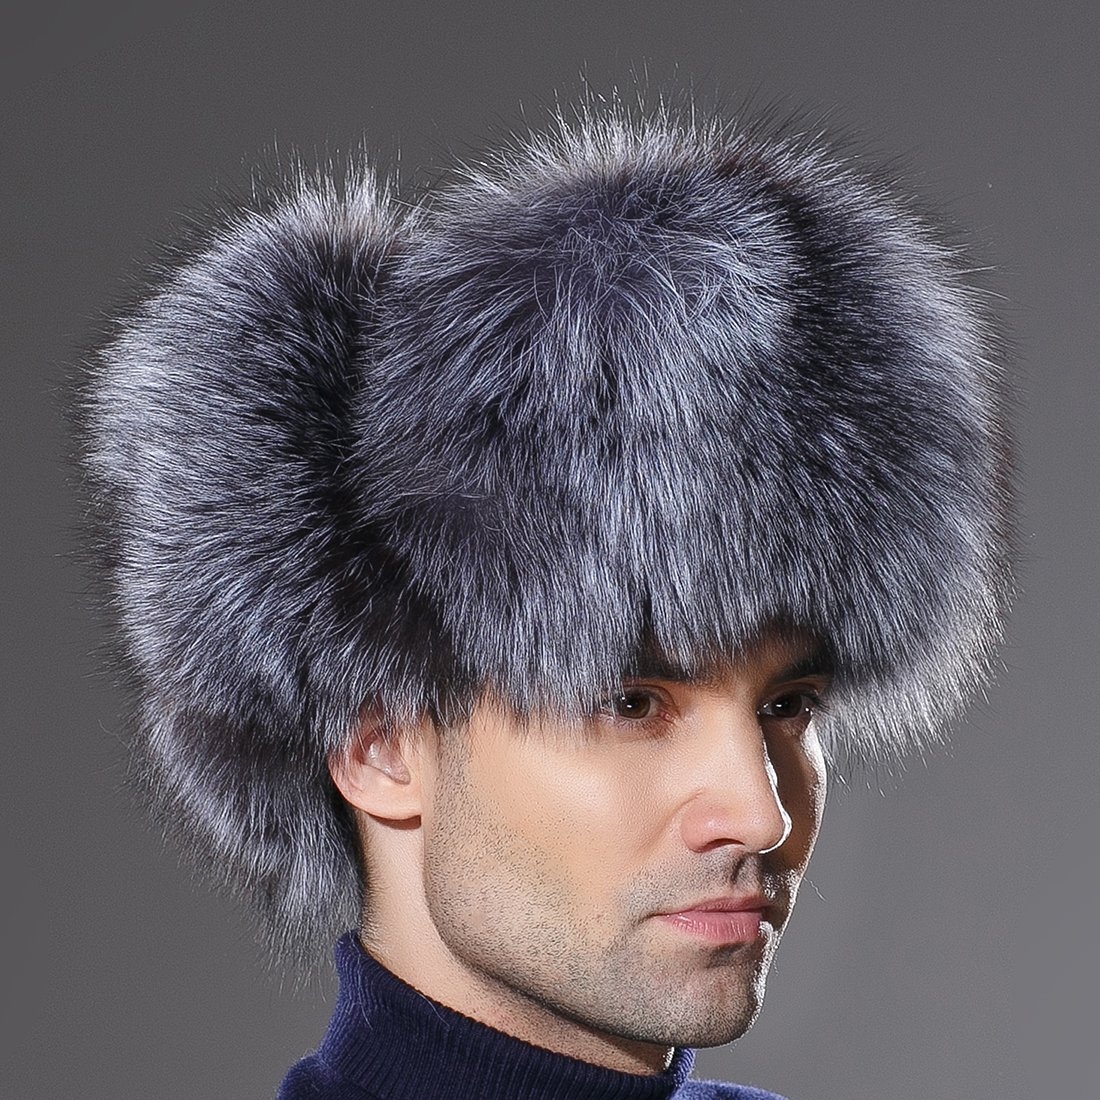 URSFUR Winter Mens Russian Ushanka Hat Real Leather & Silver Fox Fur Trapper Cap by URSFUR (Image #4)